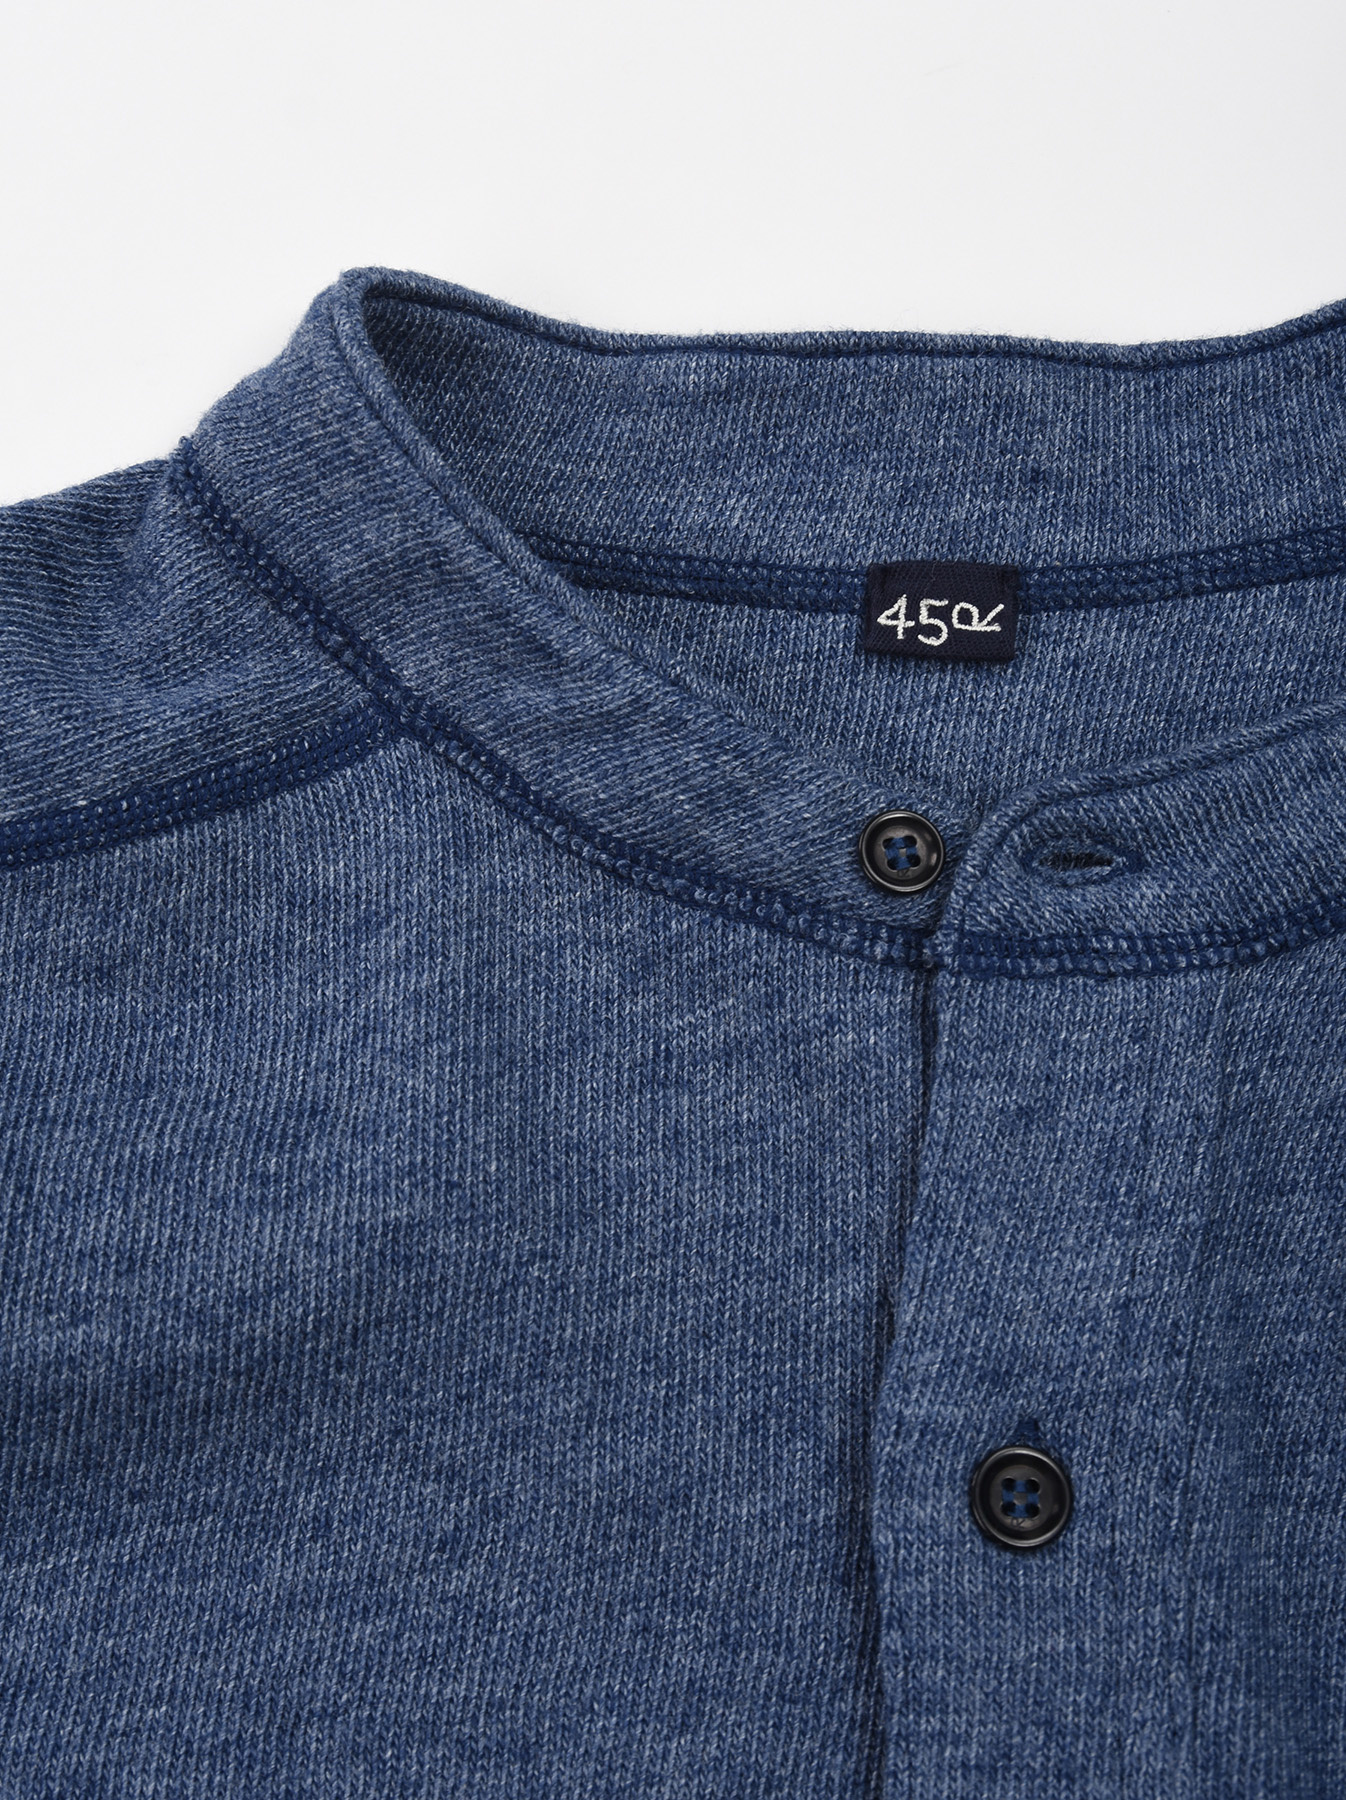 Low-gauge Tenjiku Long-sleeved Henley-8